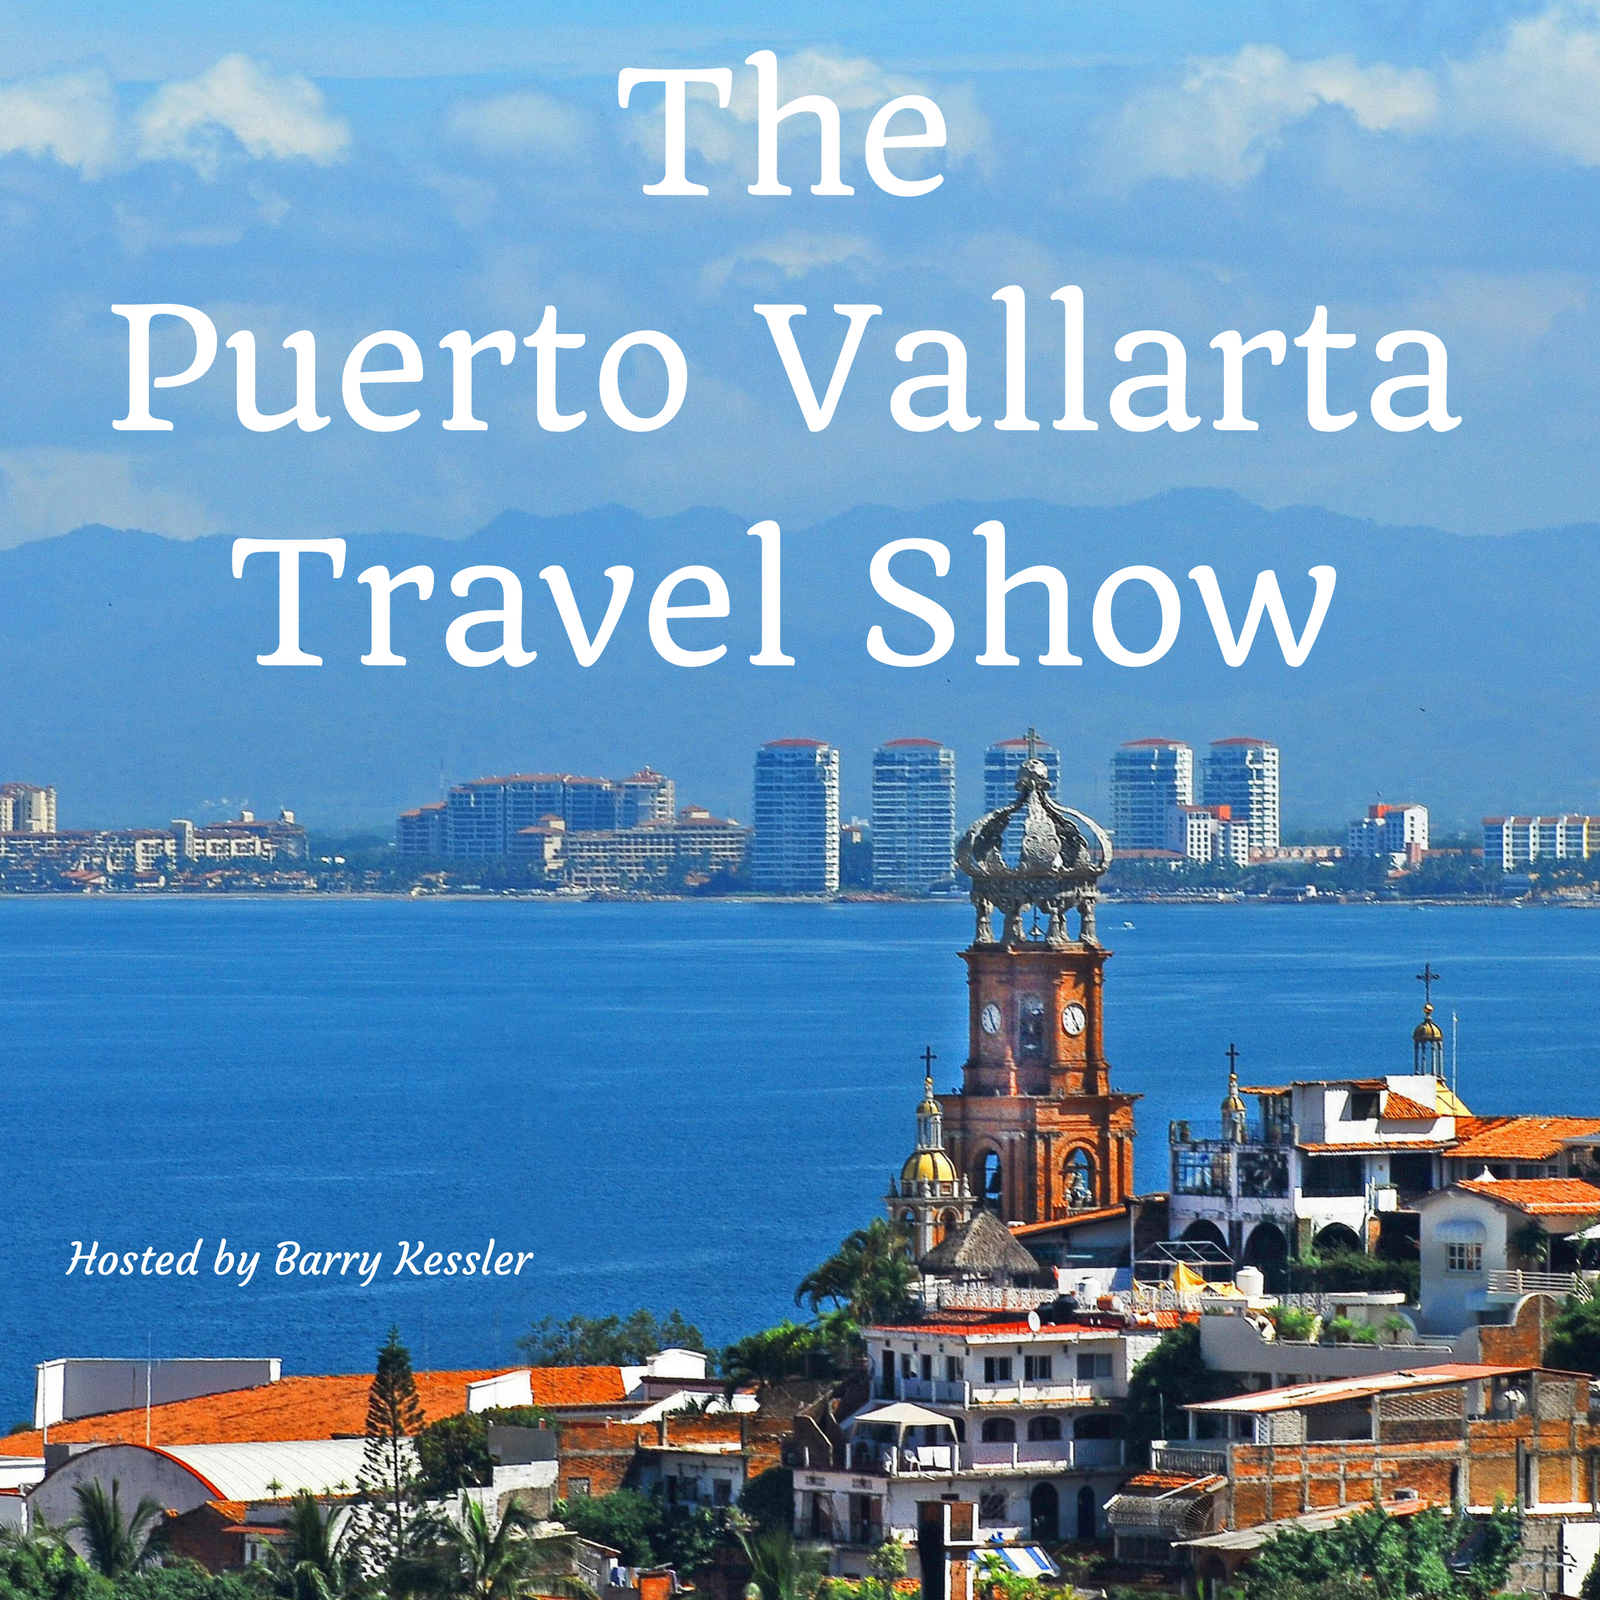 18bd9669dd9 Casa Traditional Cocina Mexicana Puerto Vallarta, Mexico Puerto Vallarta  Travel Show podcast